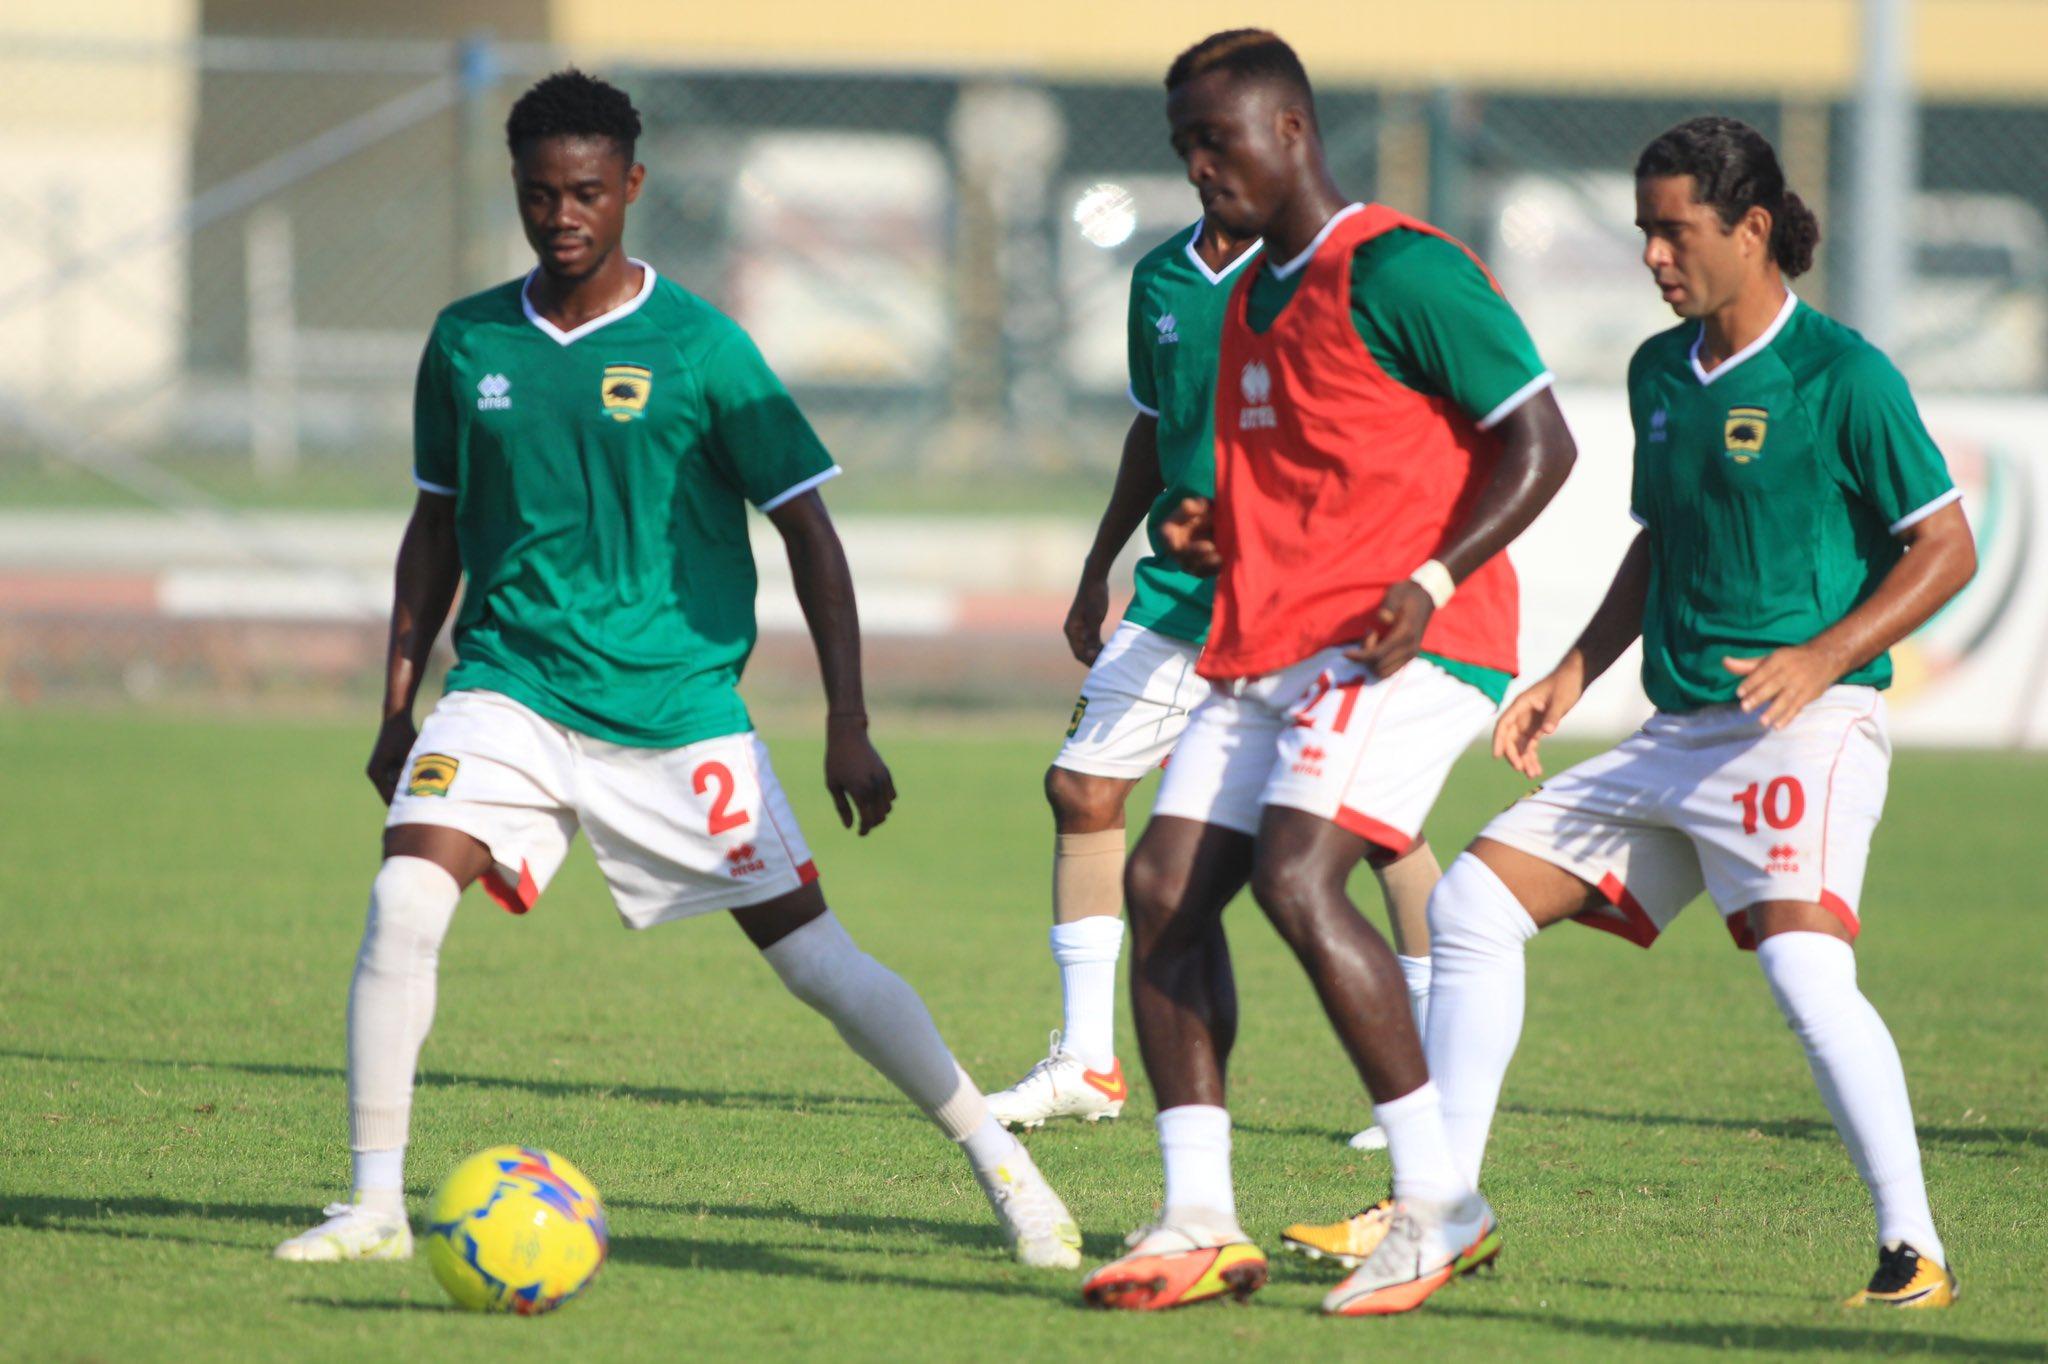 Pre-season friendly: Asante Kotoko suffer defeat to Al Hilal in Dubai